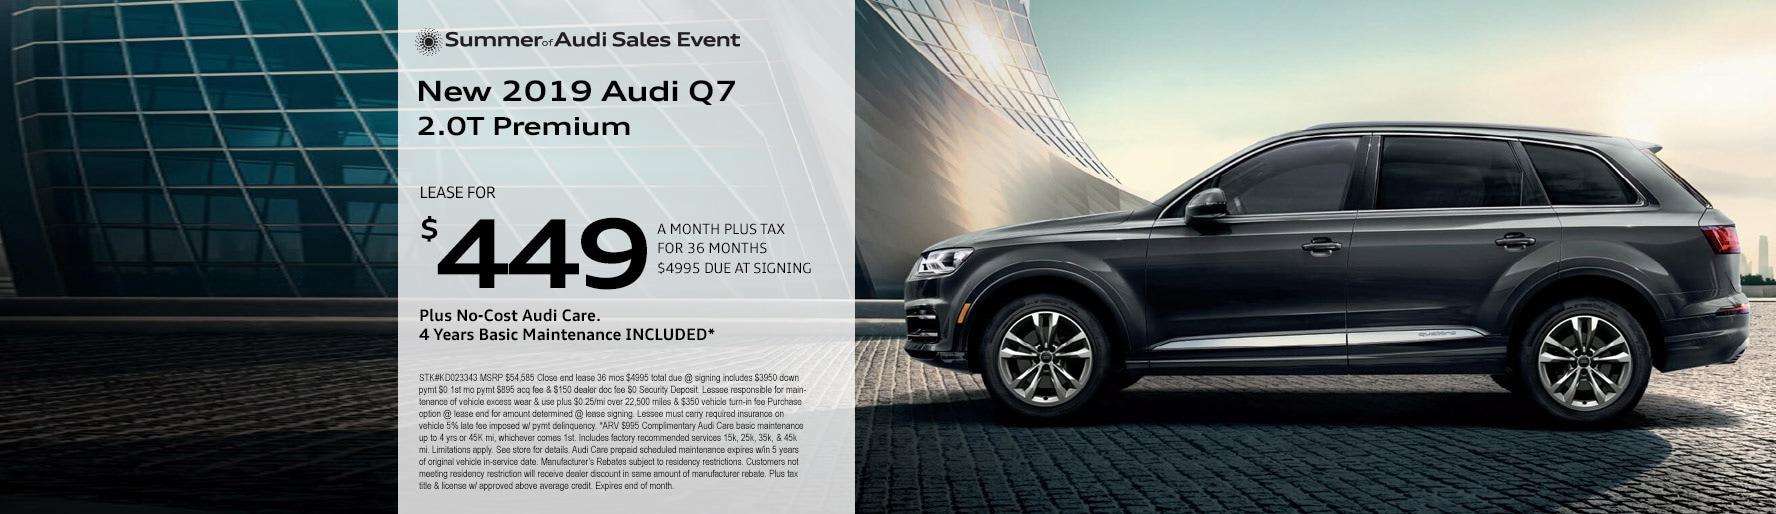 Audi Car Dealership Plano, TX | Audi Plano